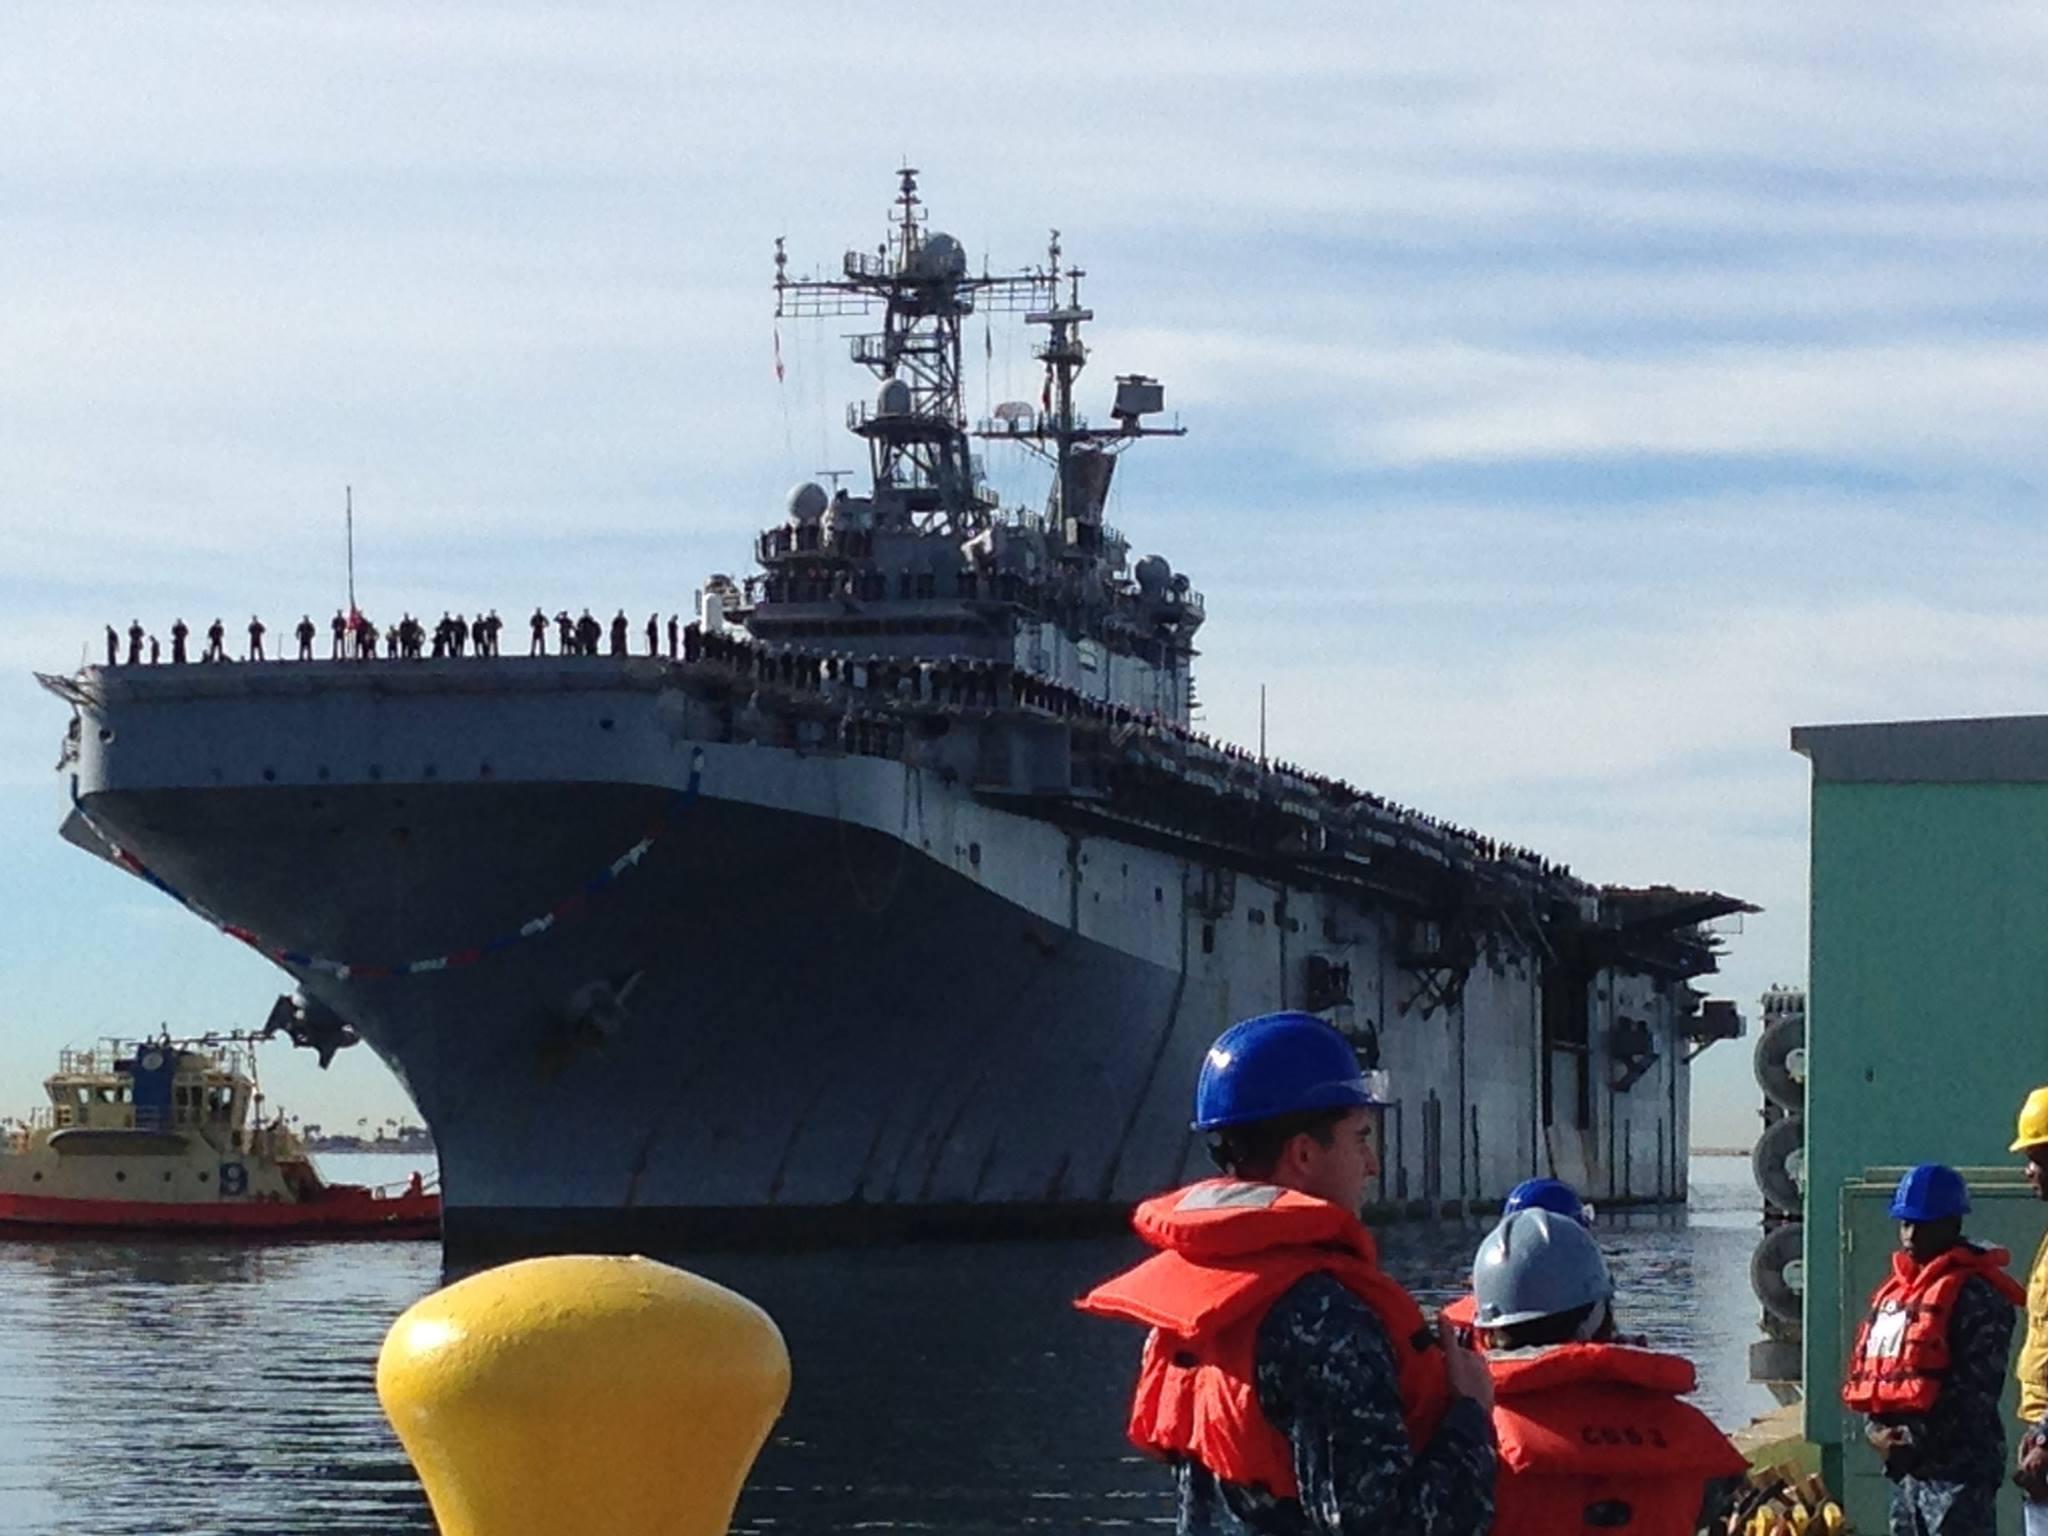 USS PELELIU LHA-5 Einlaufen San Diego am 24.12.2014 Bild: U.S. Navy